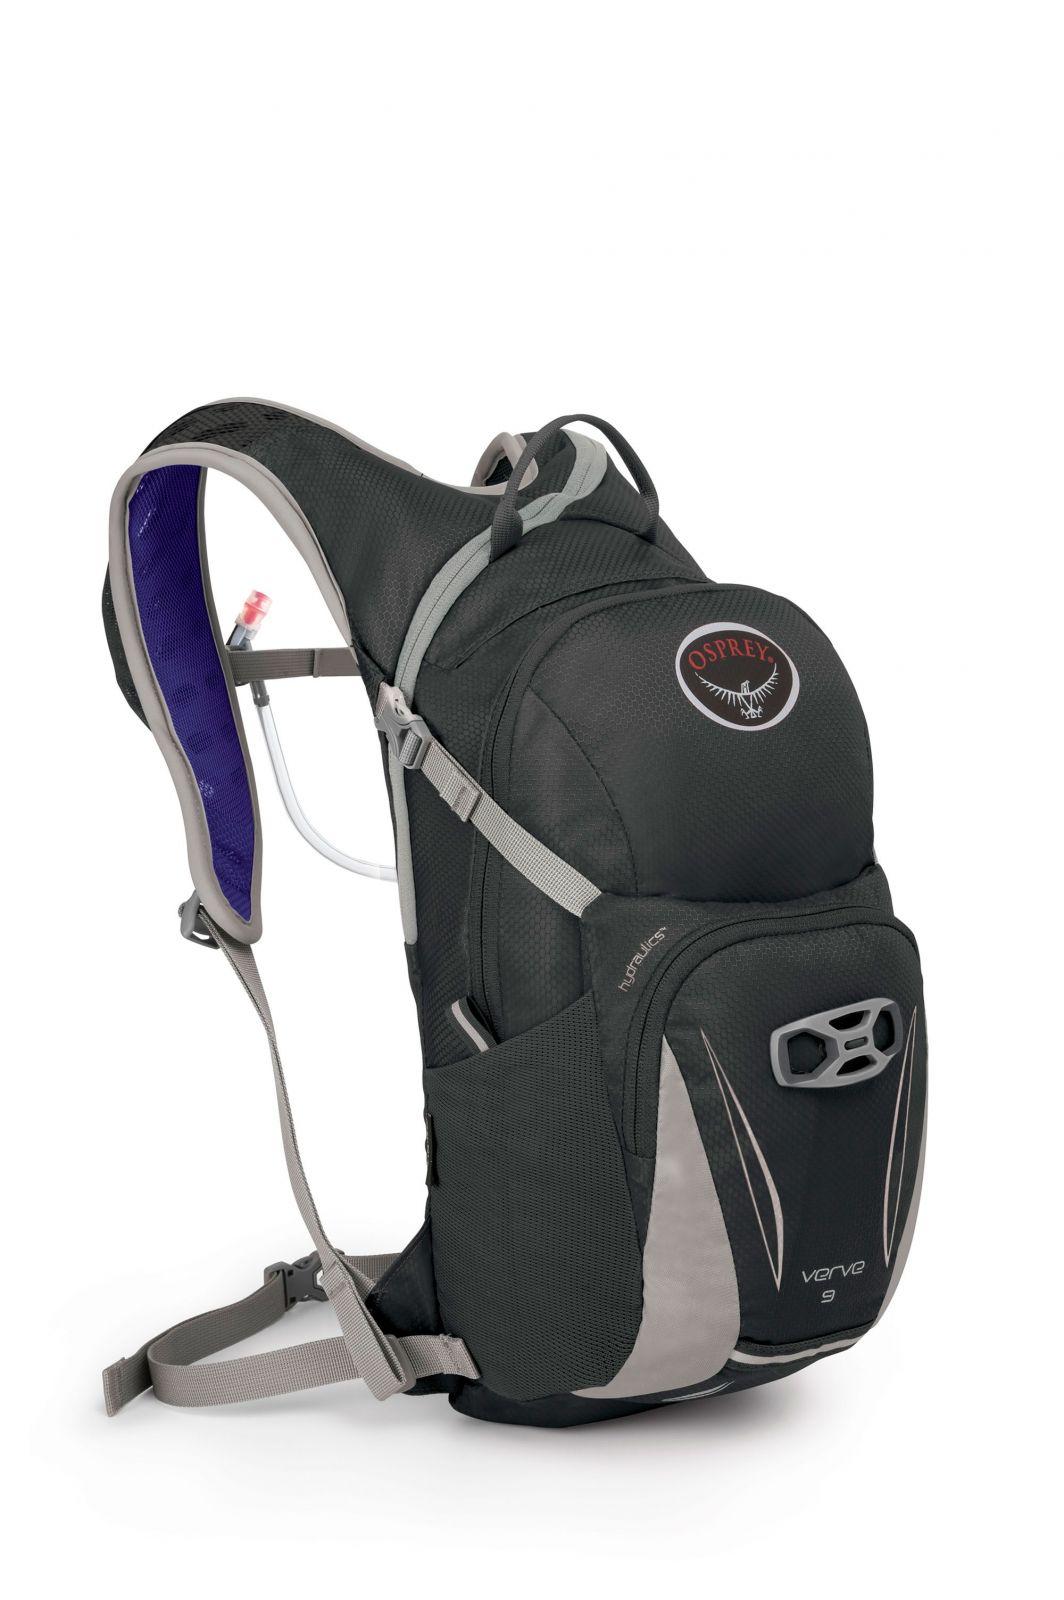 Tazz-Sport - OSPREY Verve 9 Raven Black